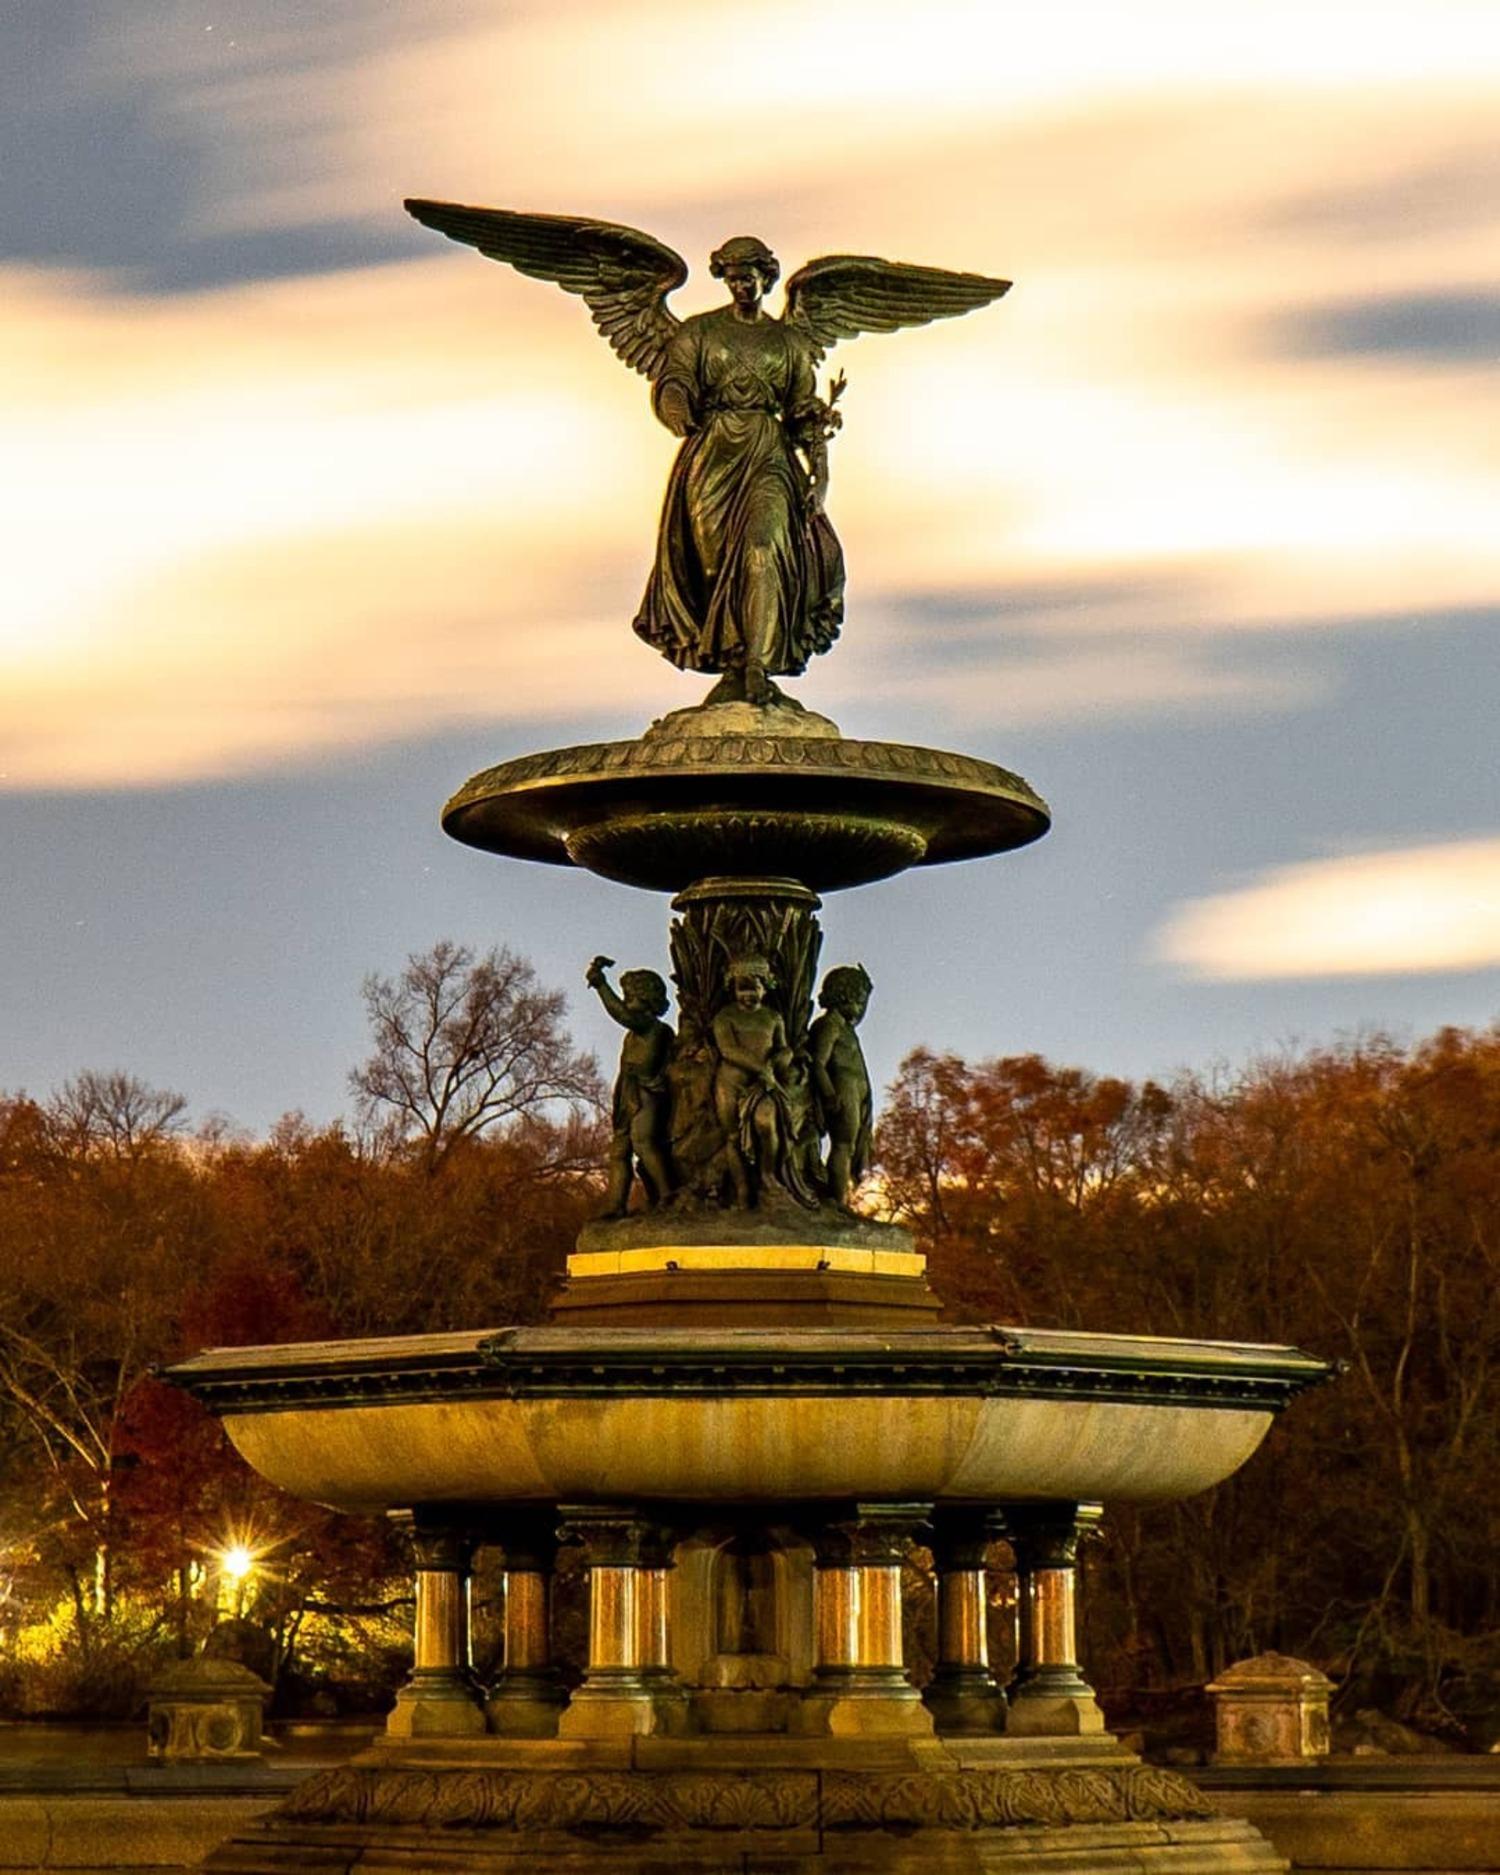 Bethesda Fountain, Central Park, Manhattan